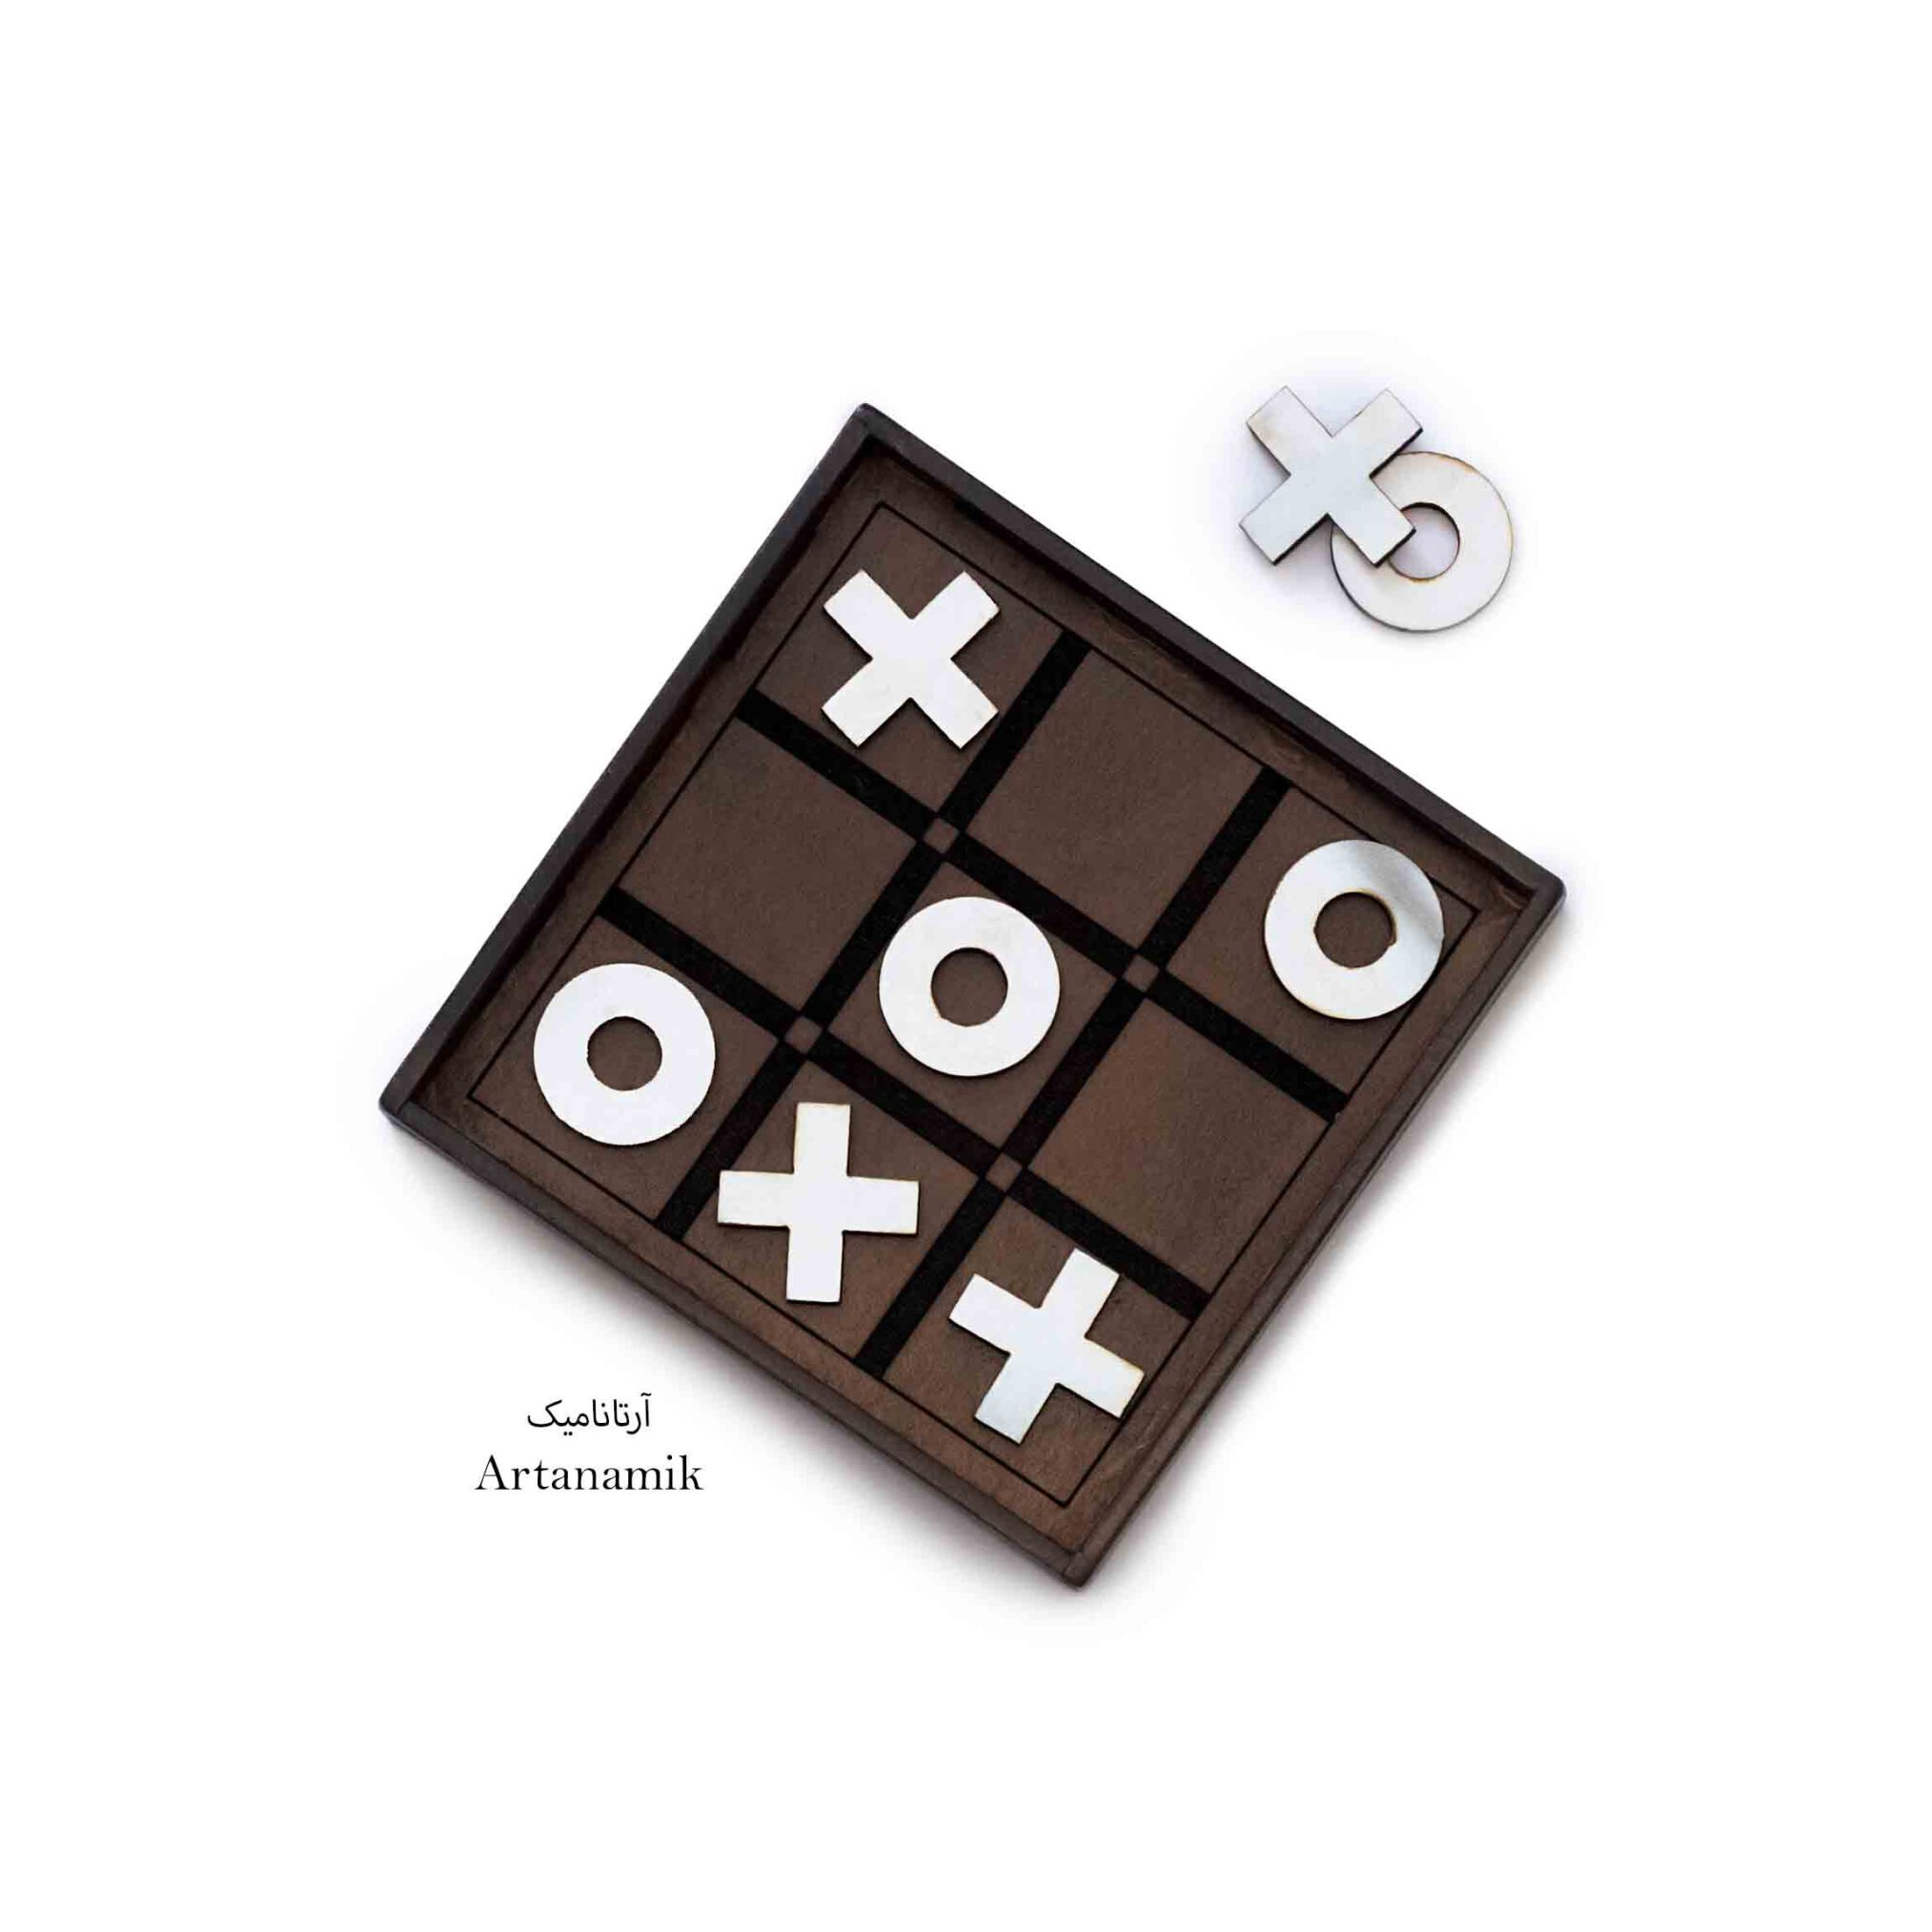 باکس کادویی شامل 6 بازی : شطرنج کادویی ، منچ ، دومینو ، دوز ، کارت ، تخته نرد کادویی.